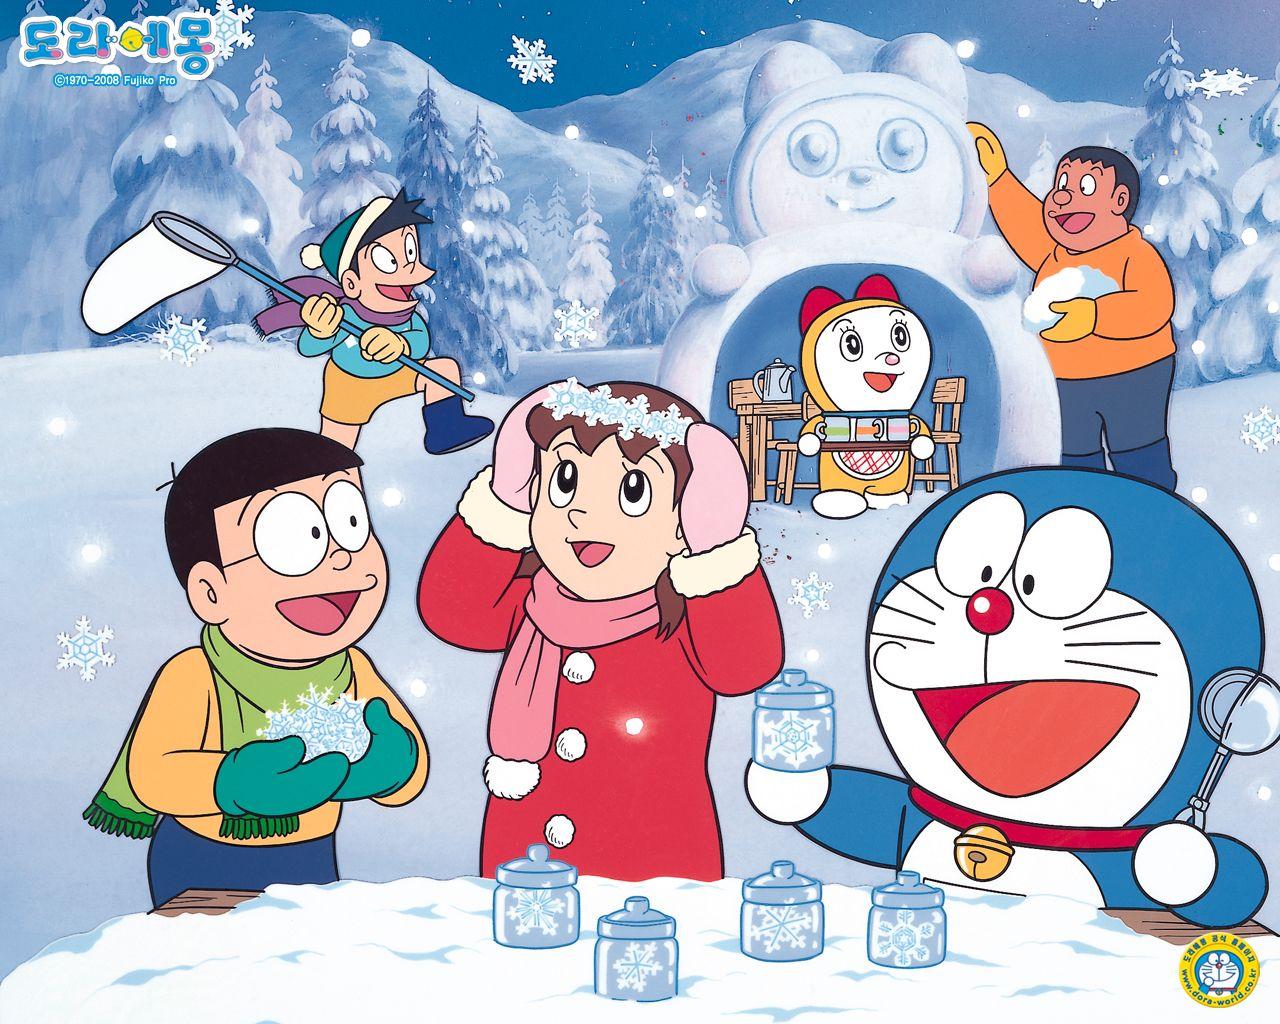 Download wallpaper doraemon free - Doraemon Wallpaper 31 Free Hd Wallpaper Desktop